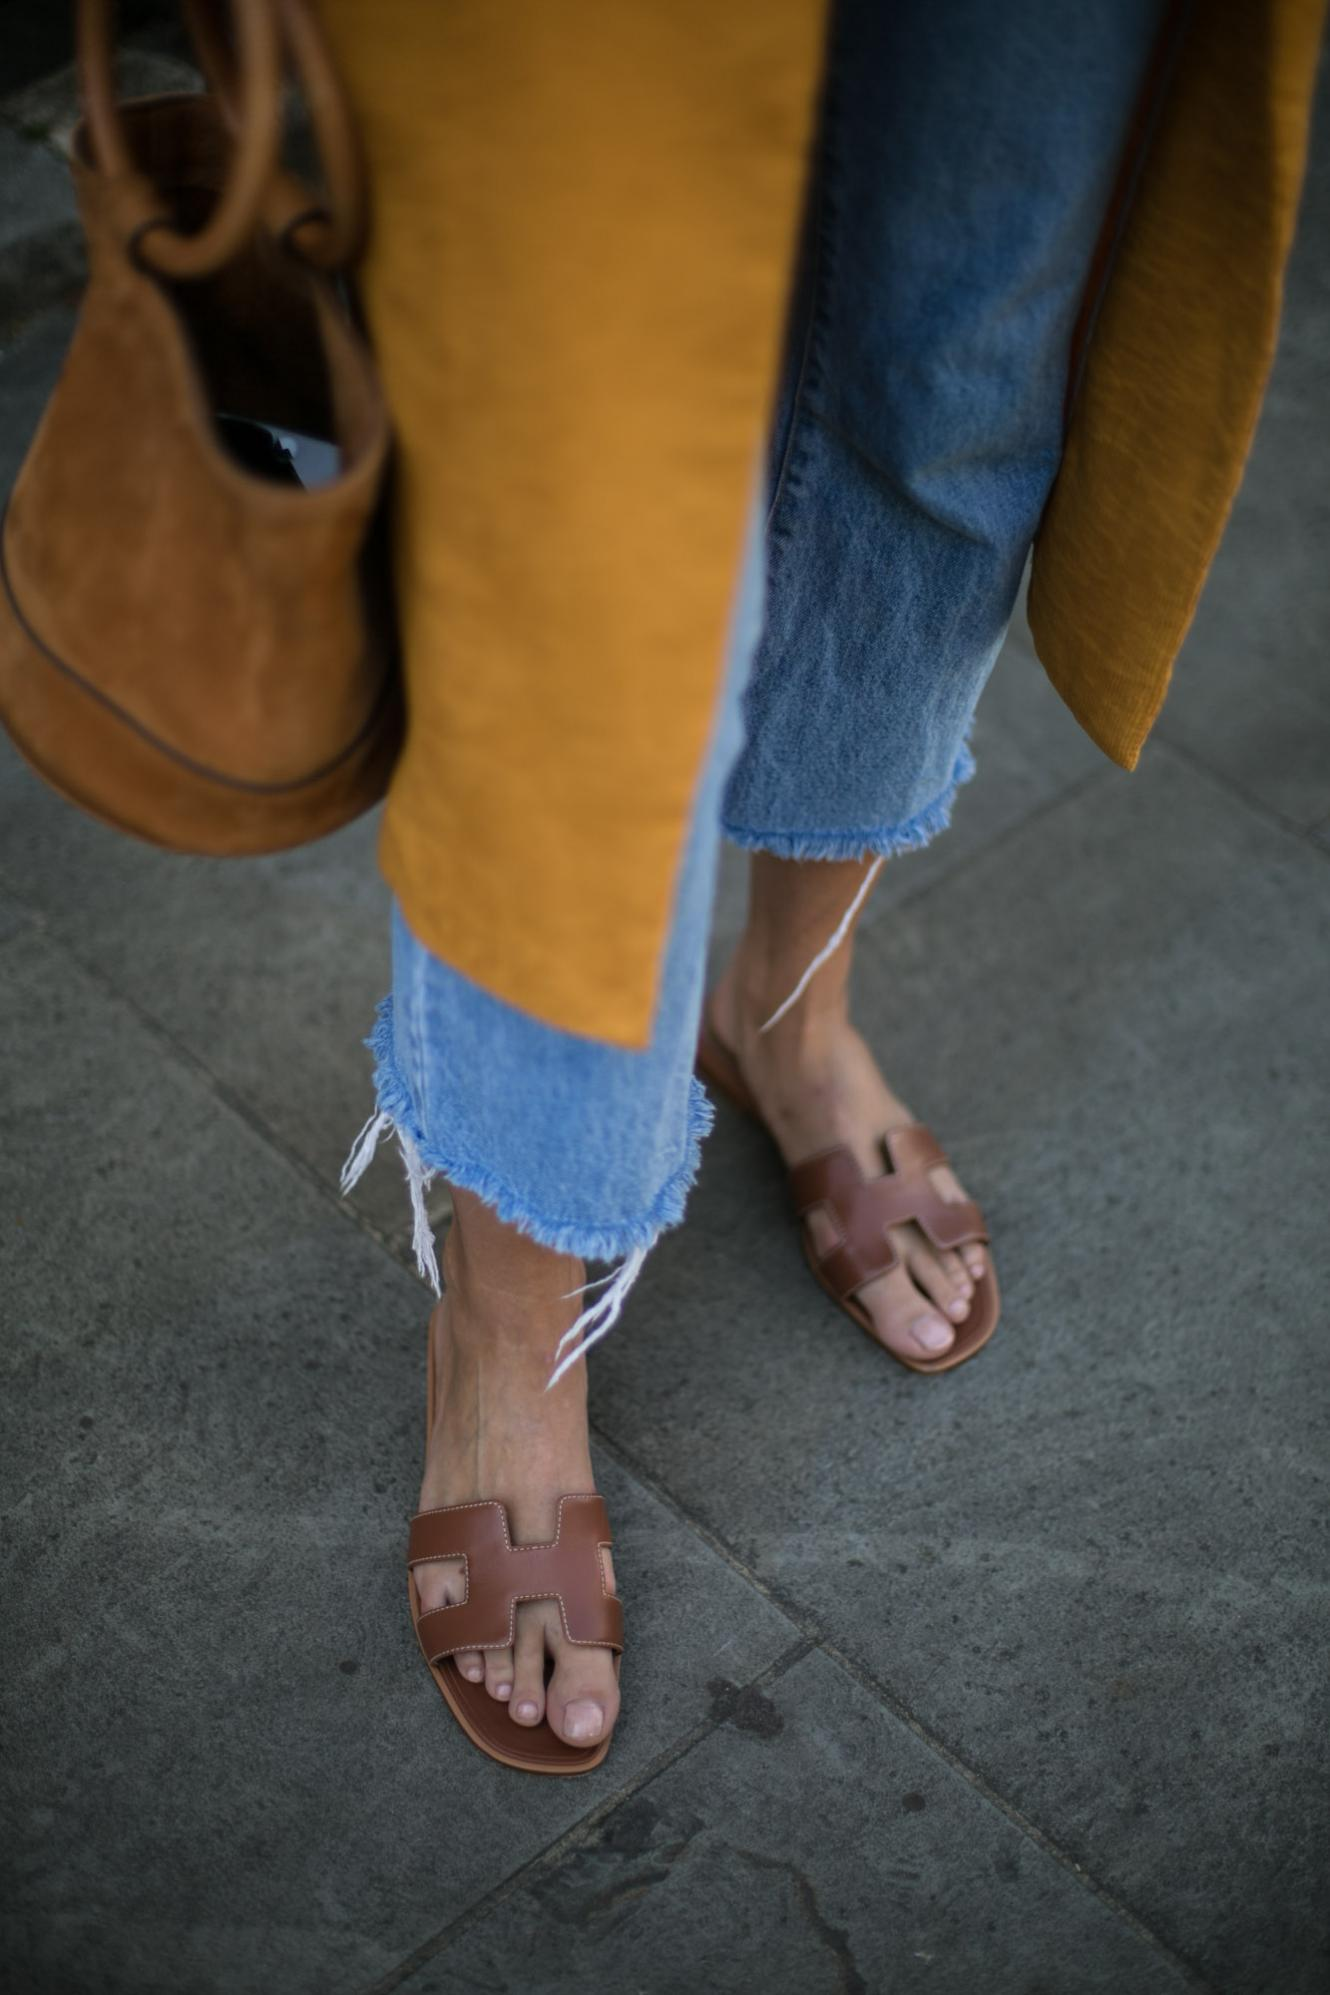 Hermes Oran sandals in tan leather